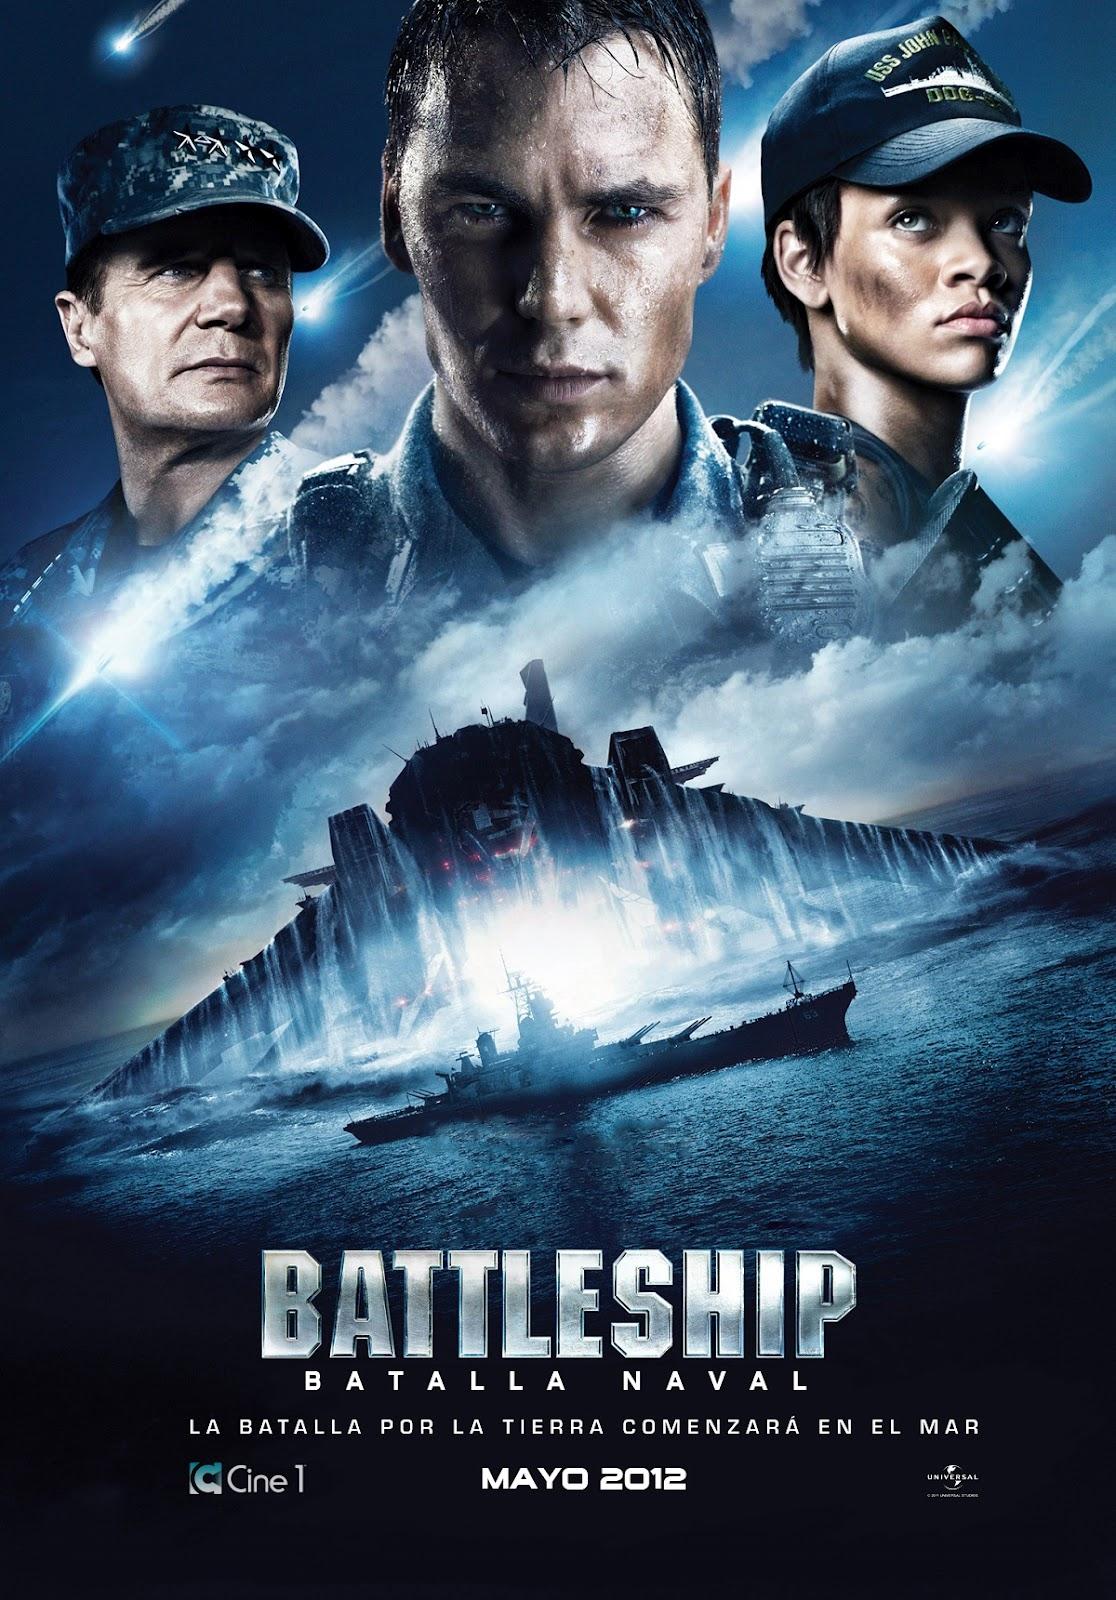 Grandes Fracasos del Cine - Página 3 Battleship%2BLatest%2BPoster%2B%25282%2529